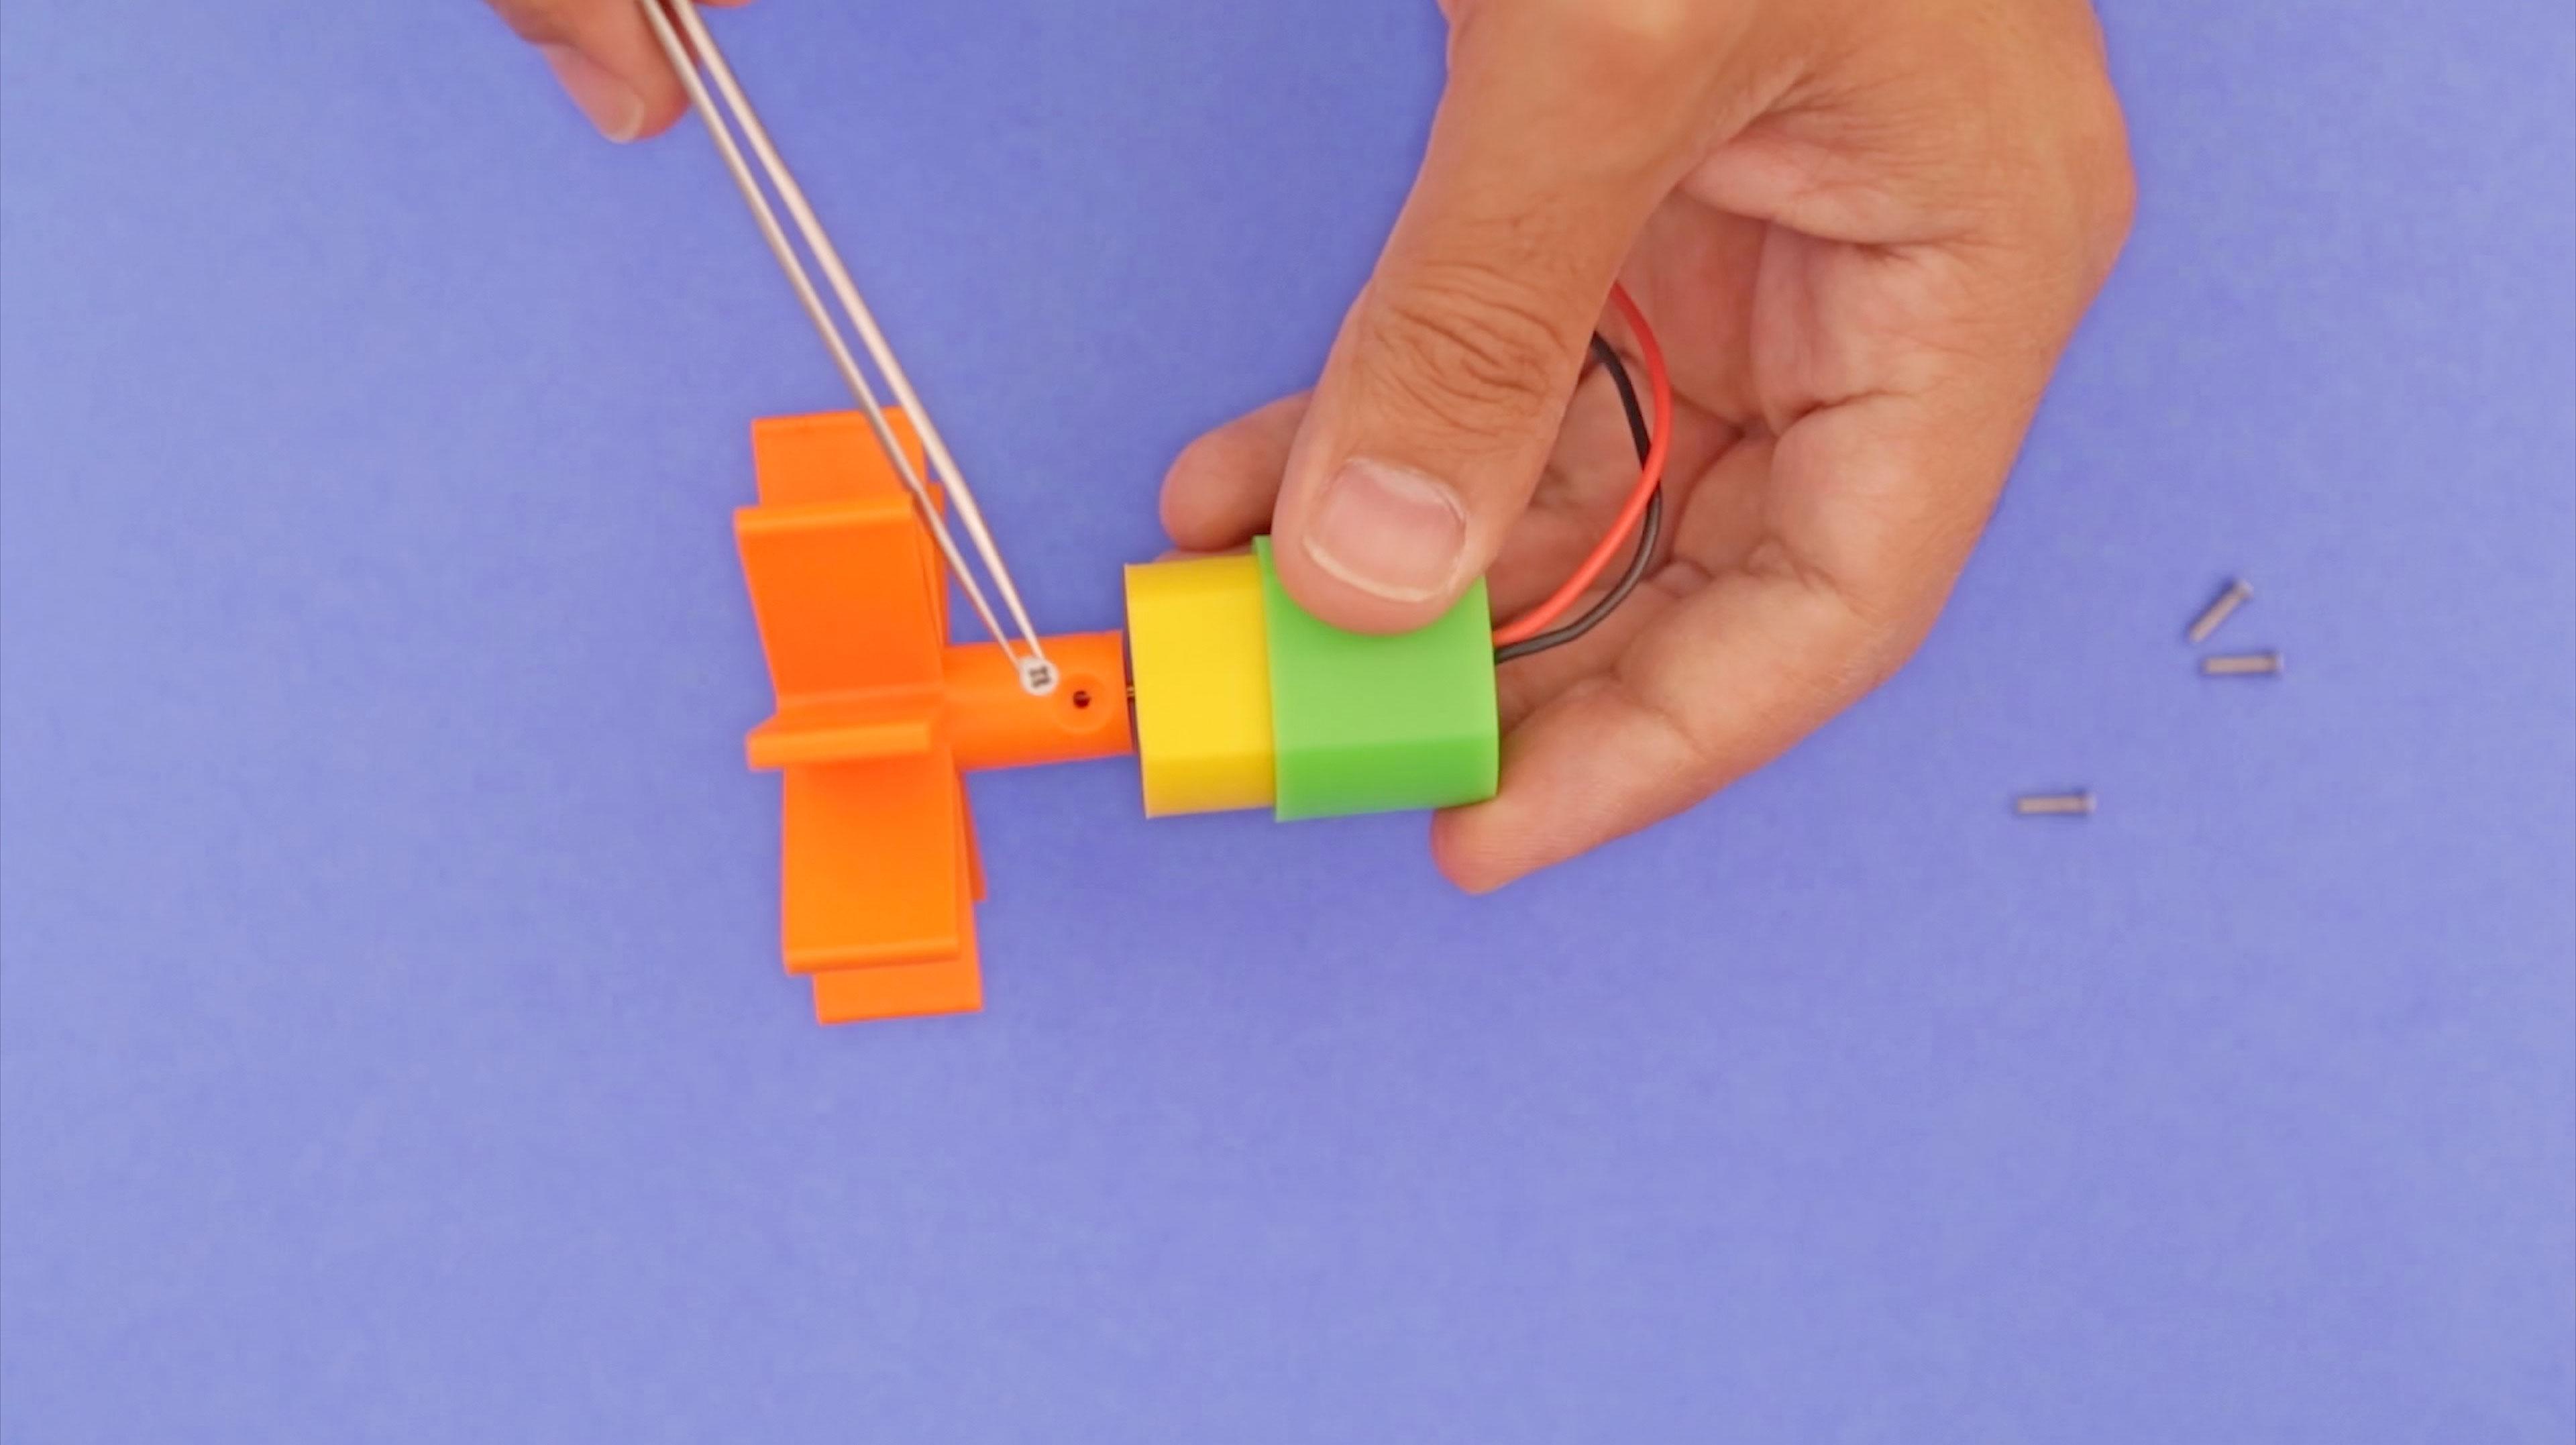 3d_printing_motor-screw-insert.jpg